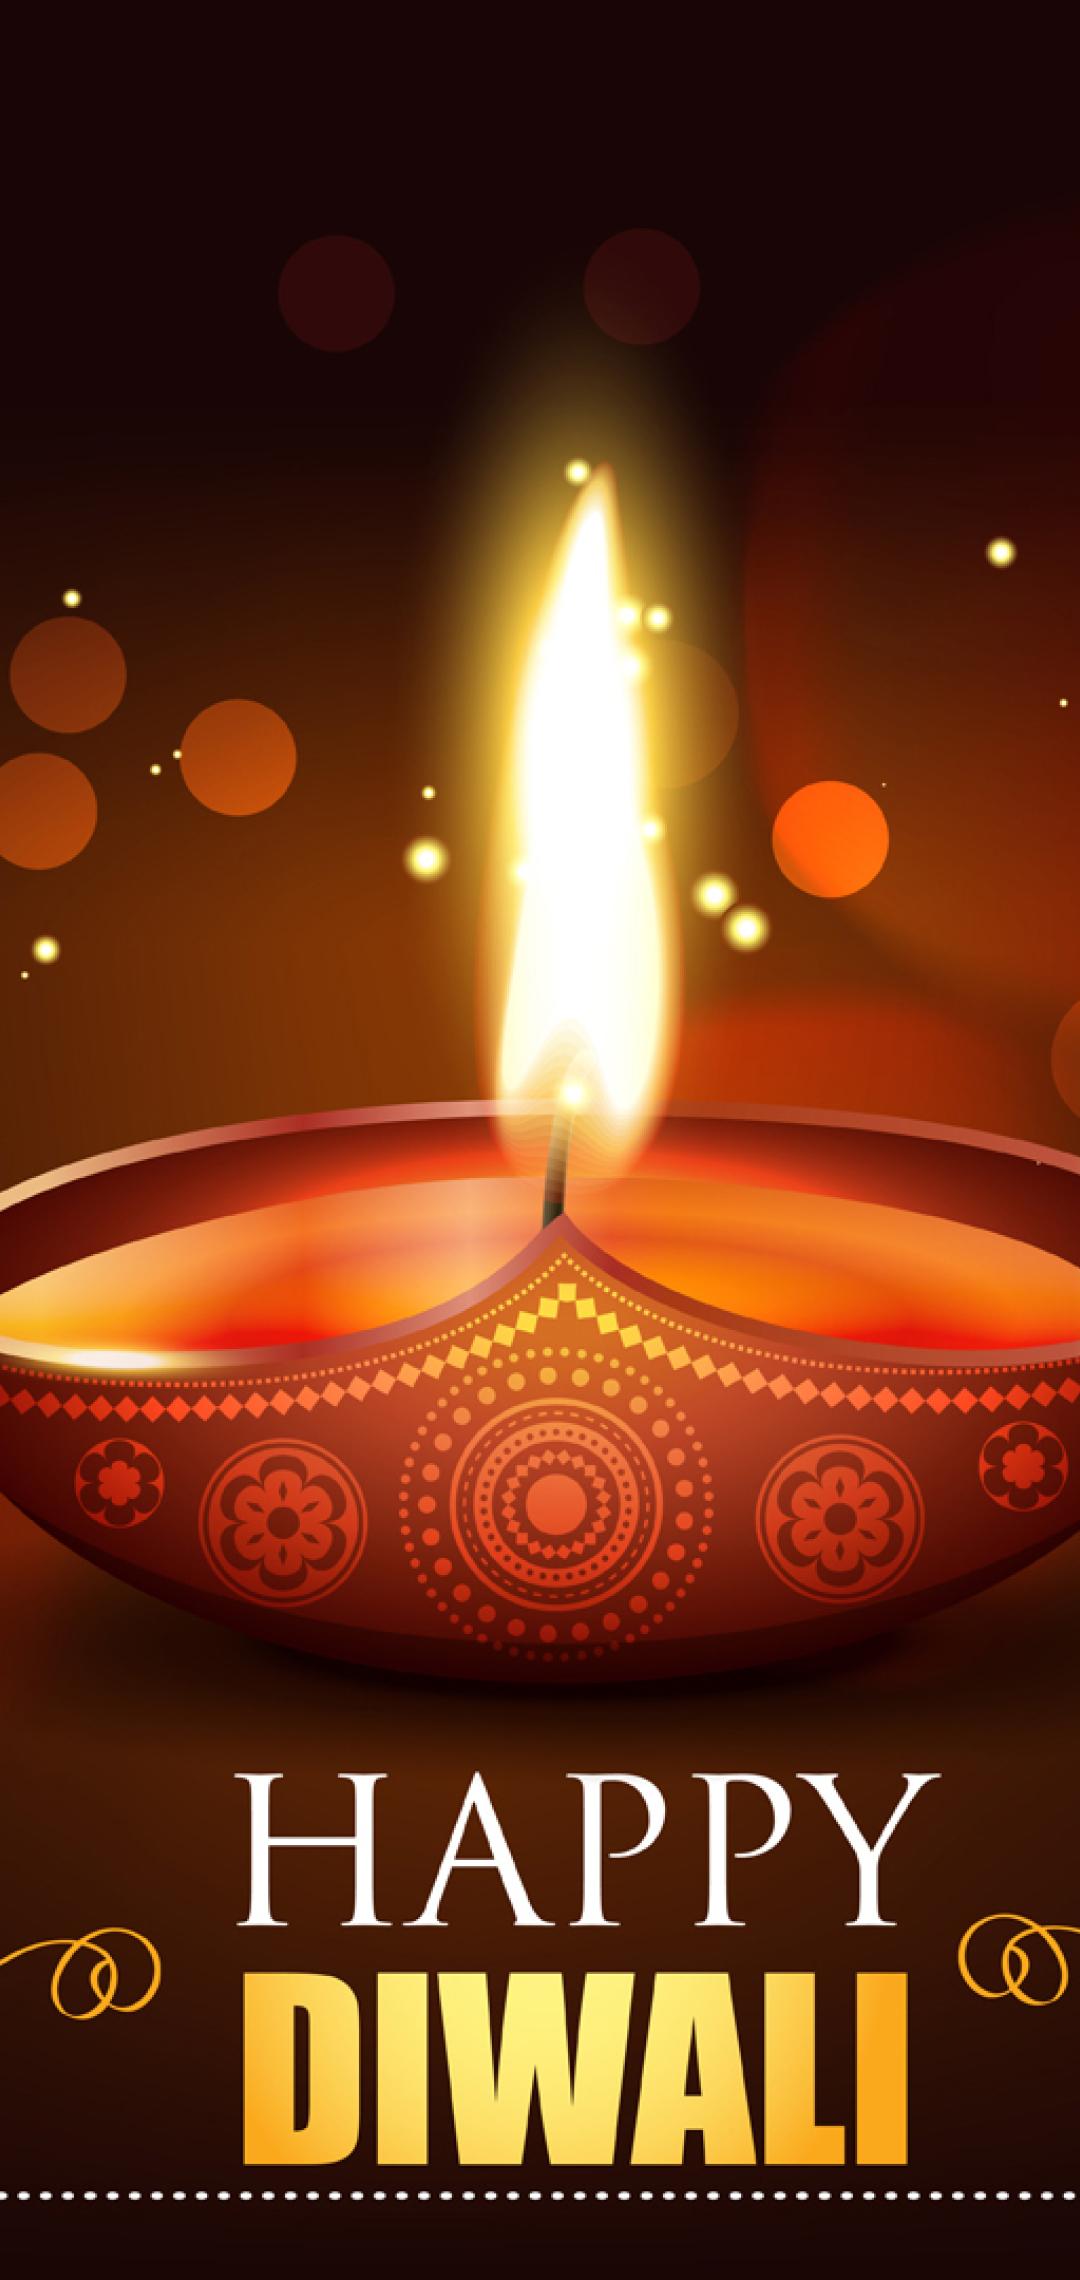 Happy Diwali 2020 Wallpaper in 1080x2280 Resolution